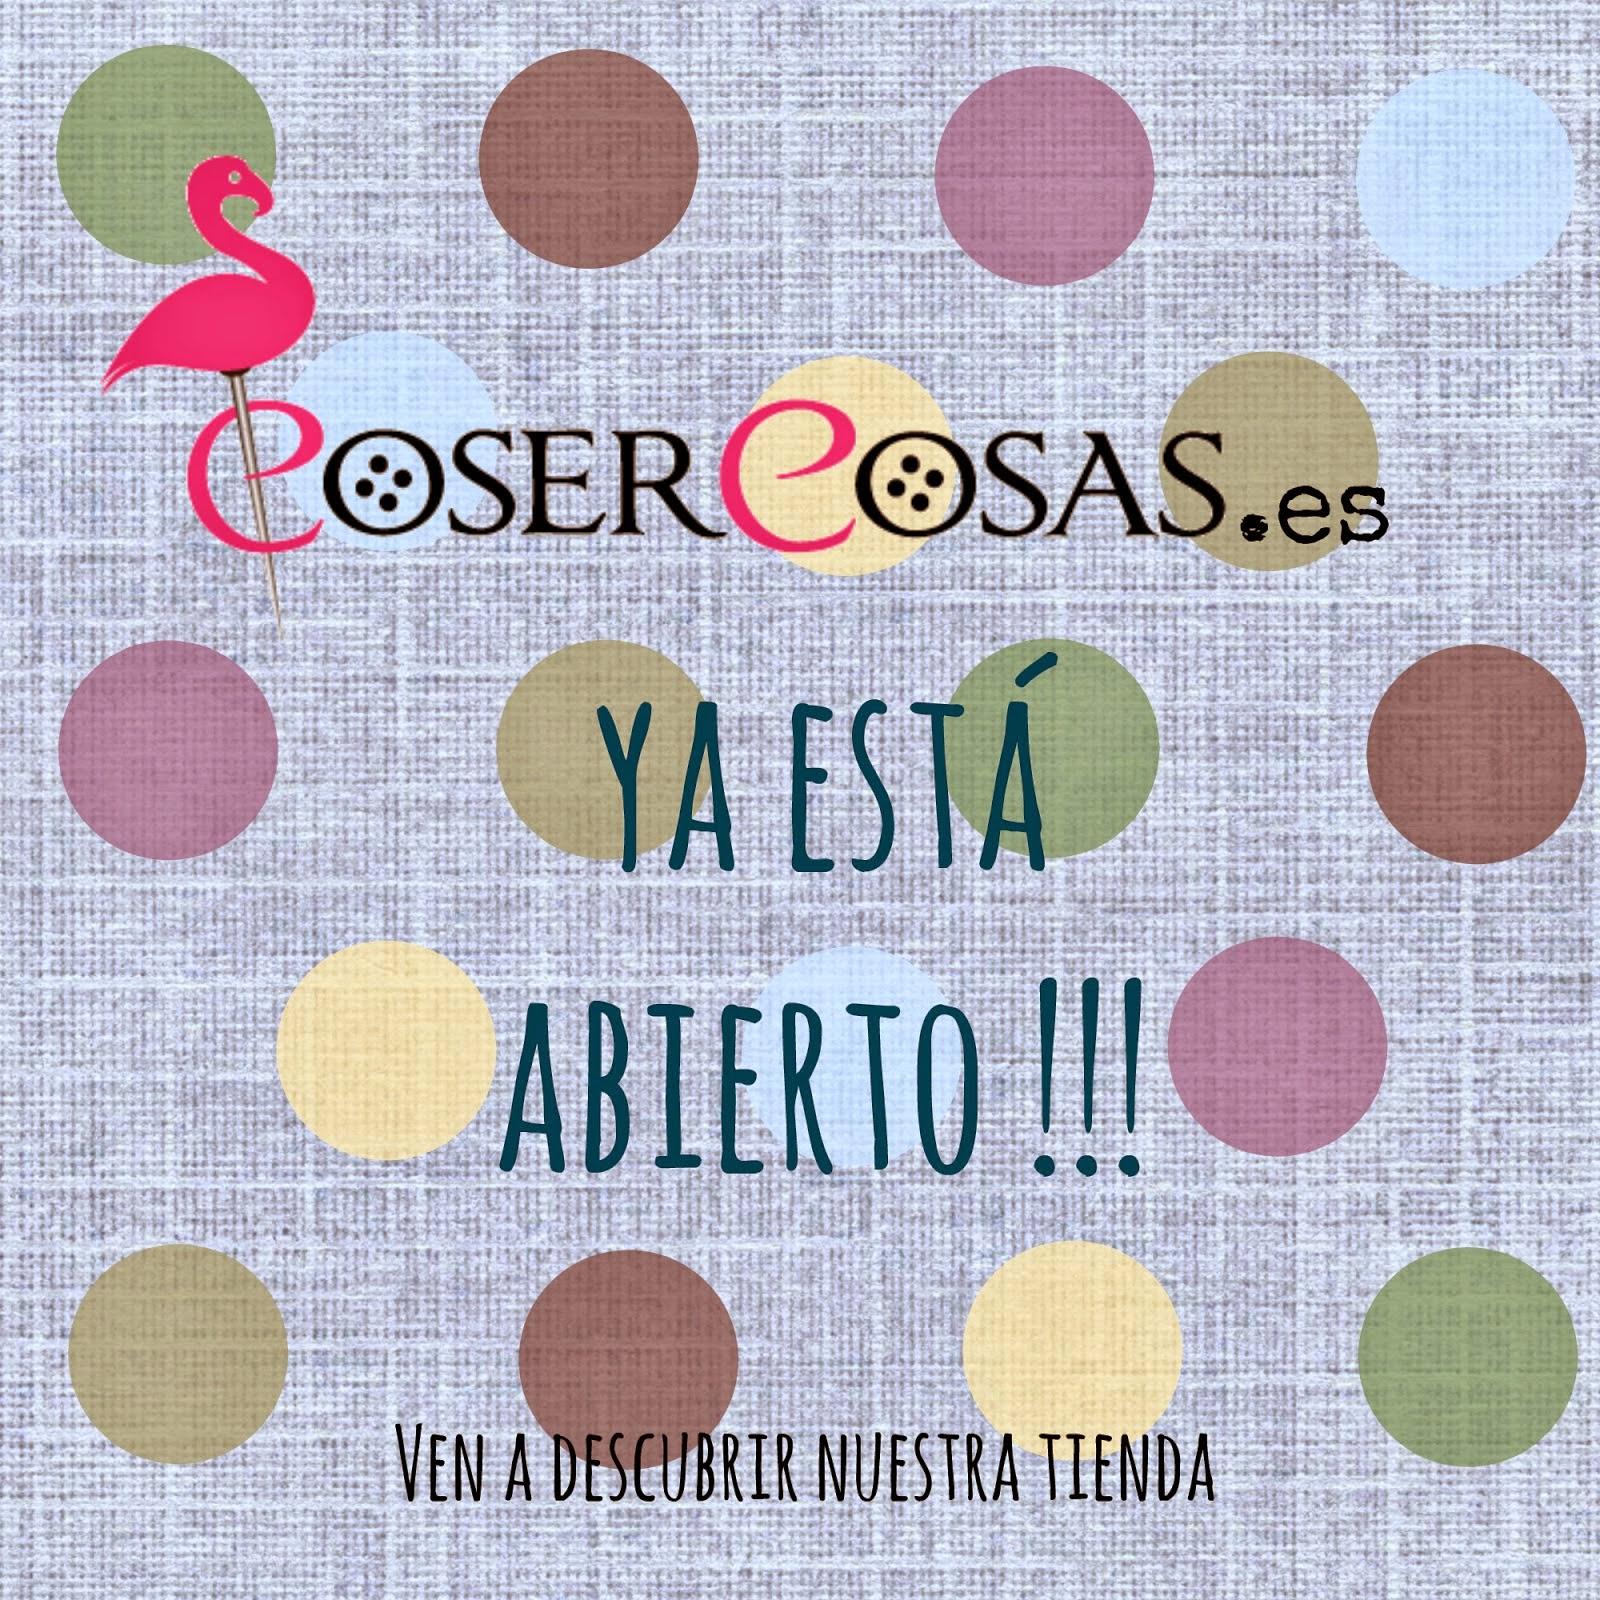 http://www.cosercosas.es/